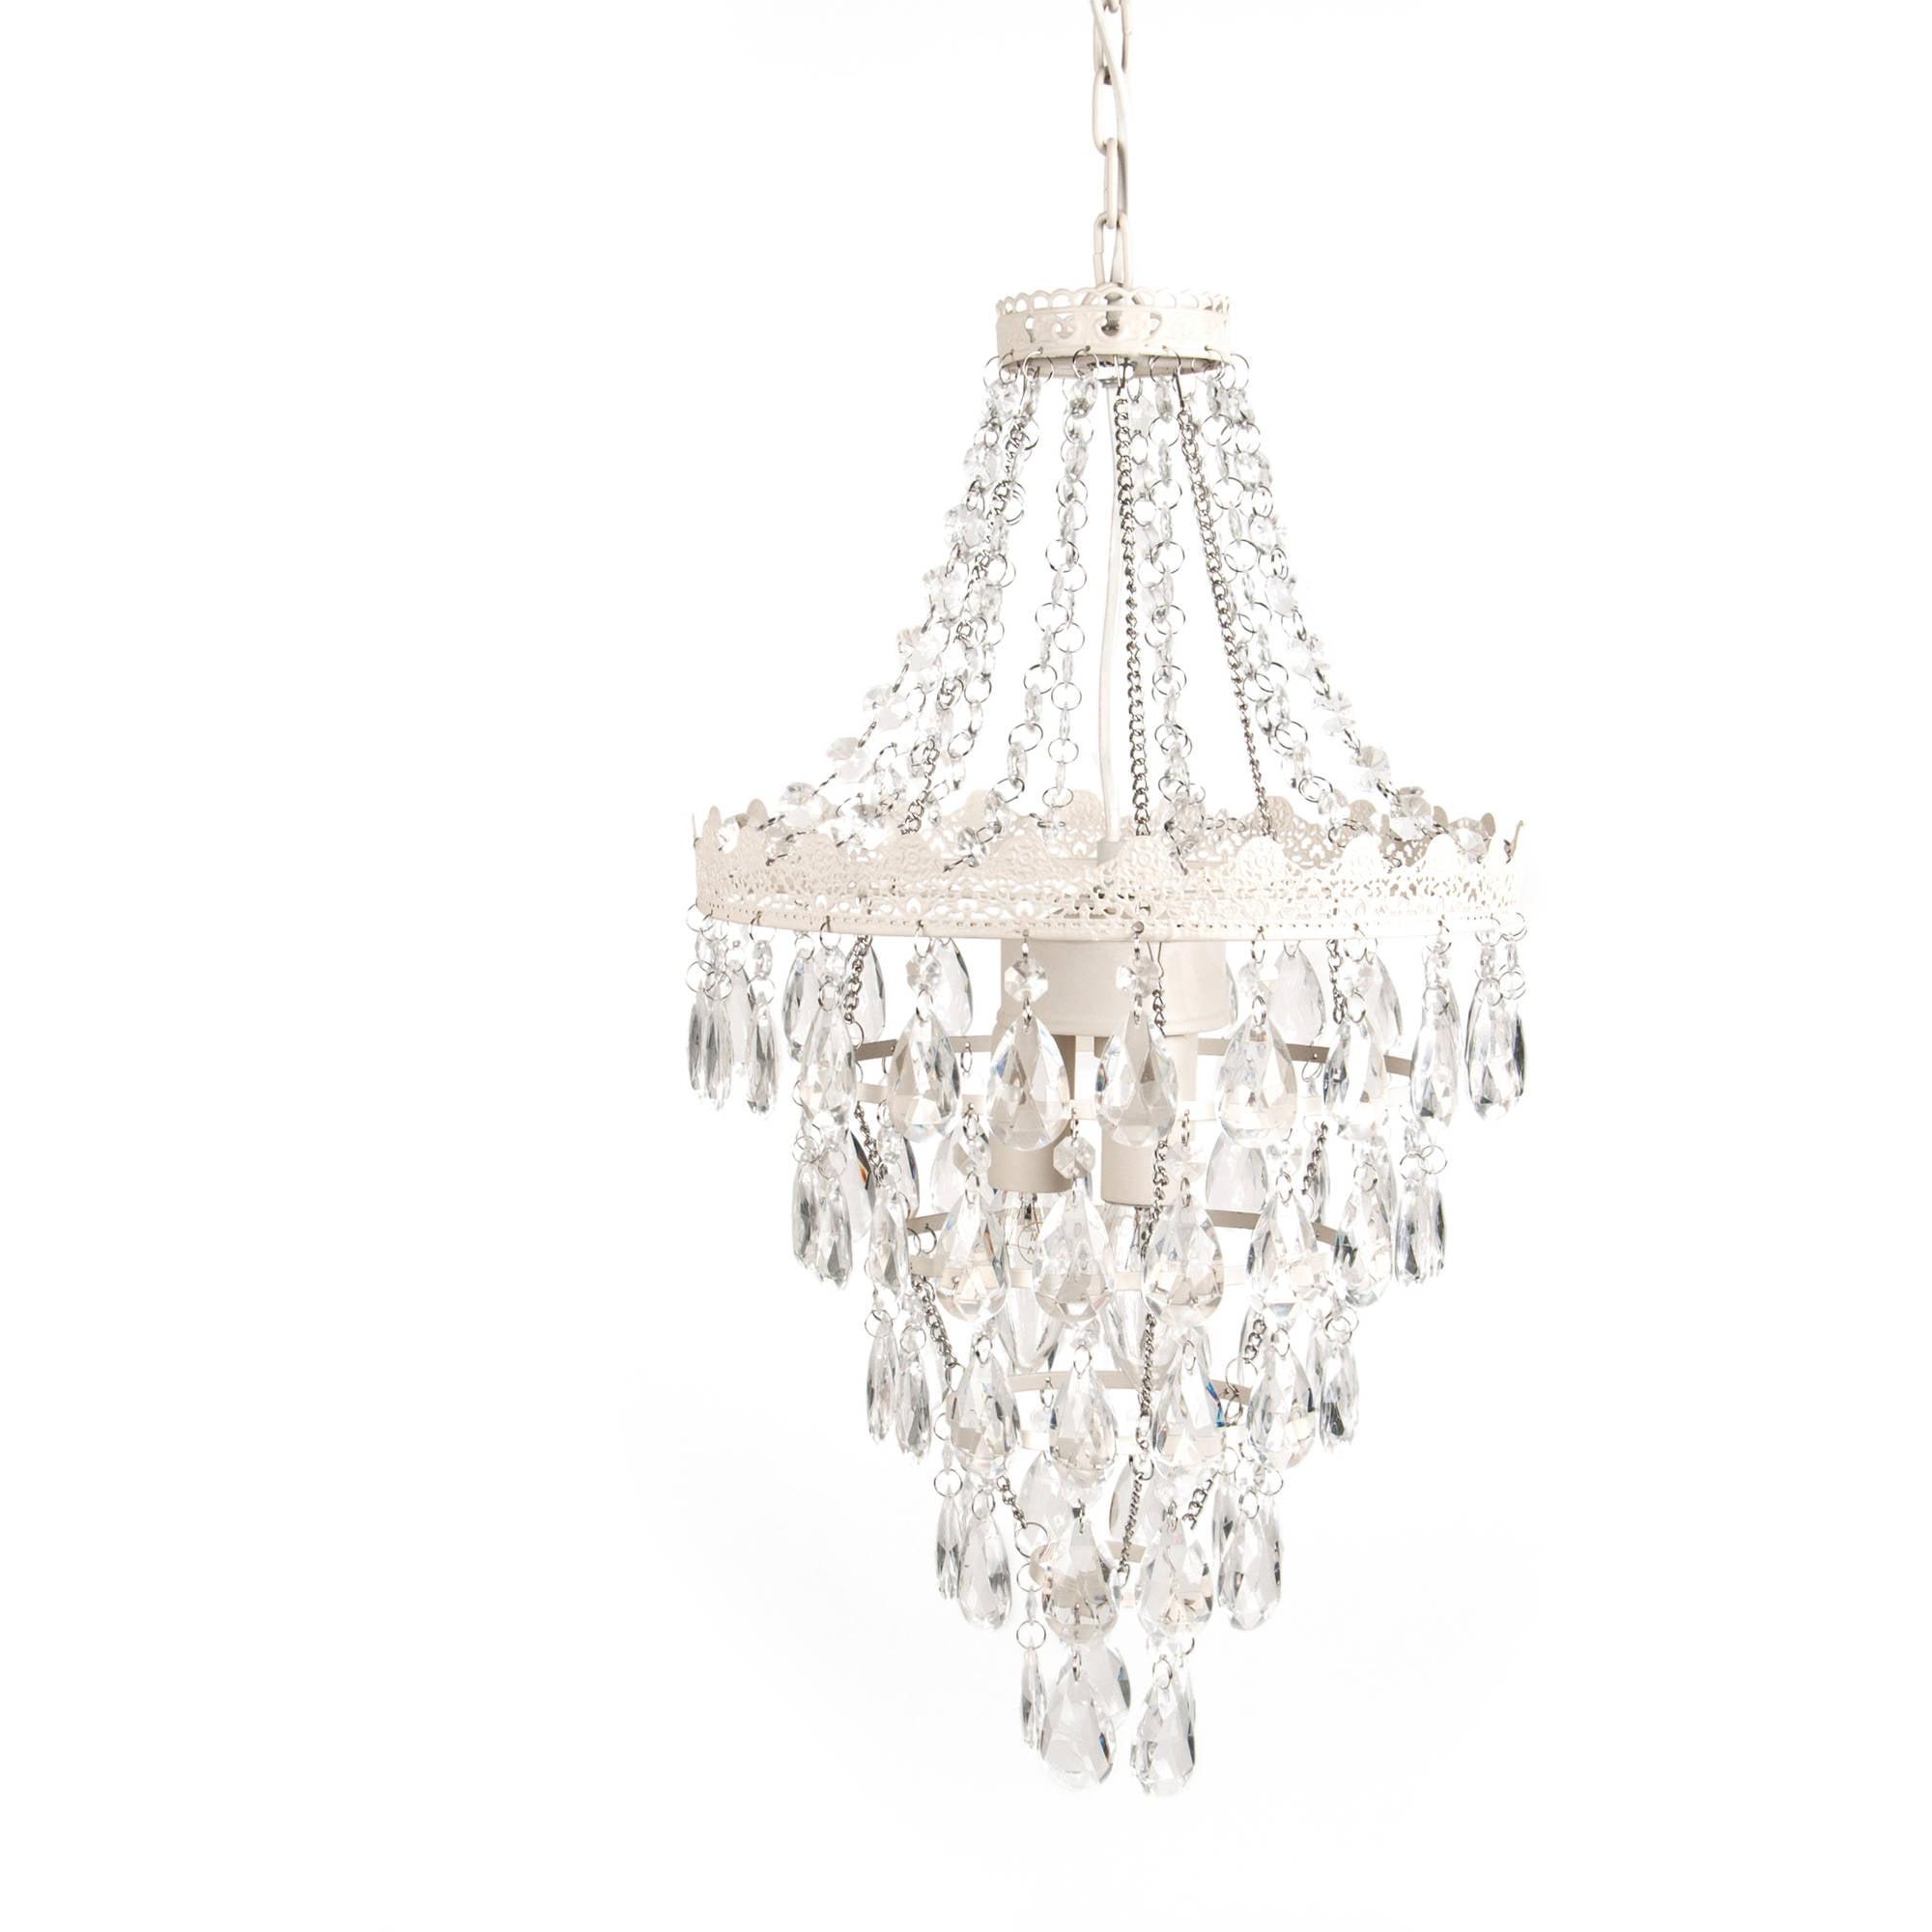 Tadpoles Pendant Lamp Chandelier, White Diamond by Tadpoles